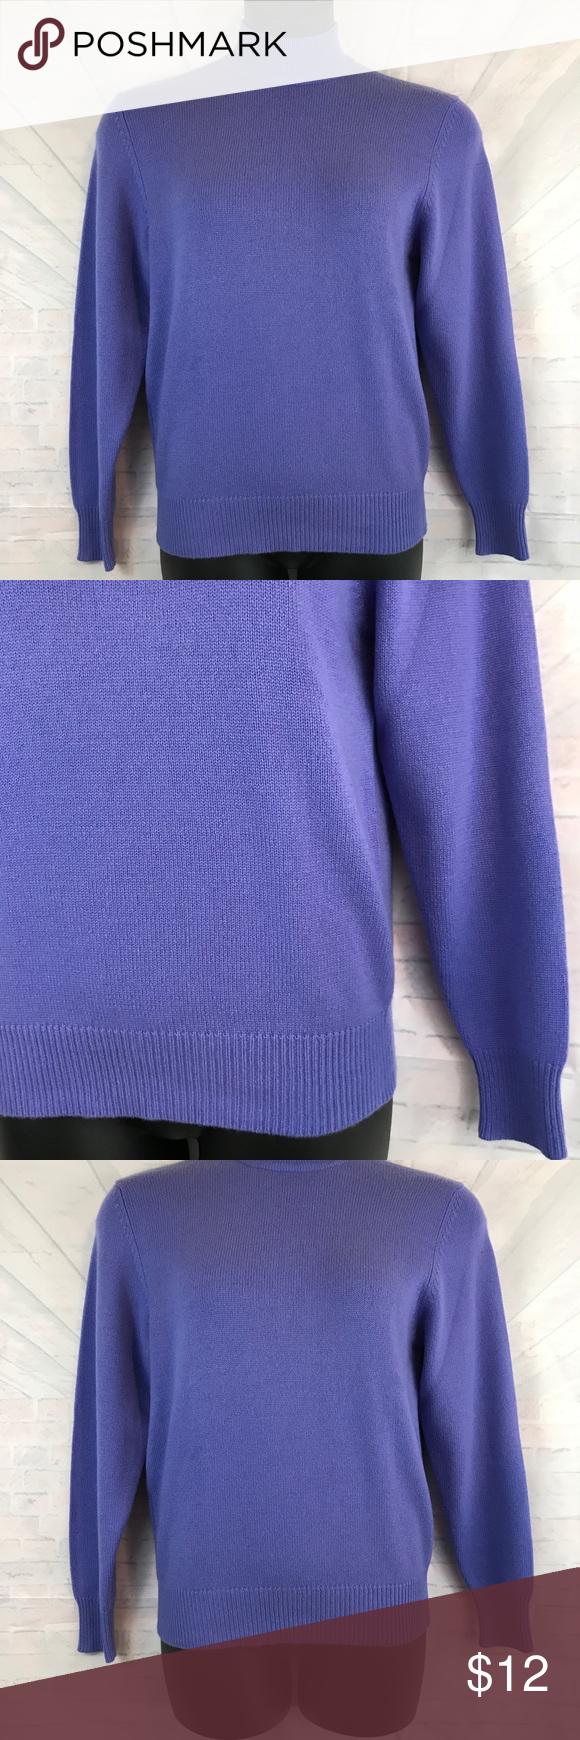 Neiman Marcus Womens Size Medium Cashmere | Neiman marcus, Arm ...